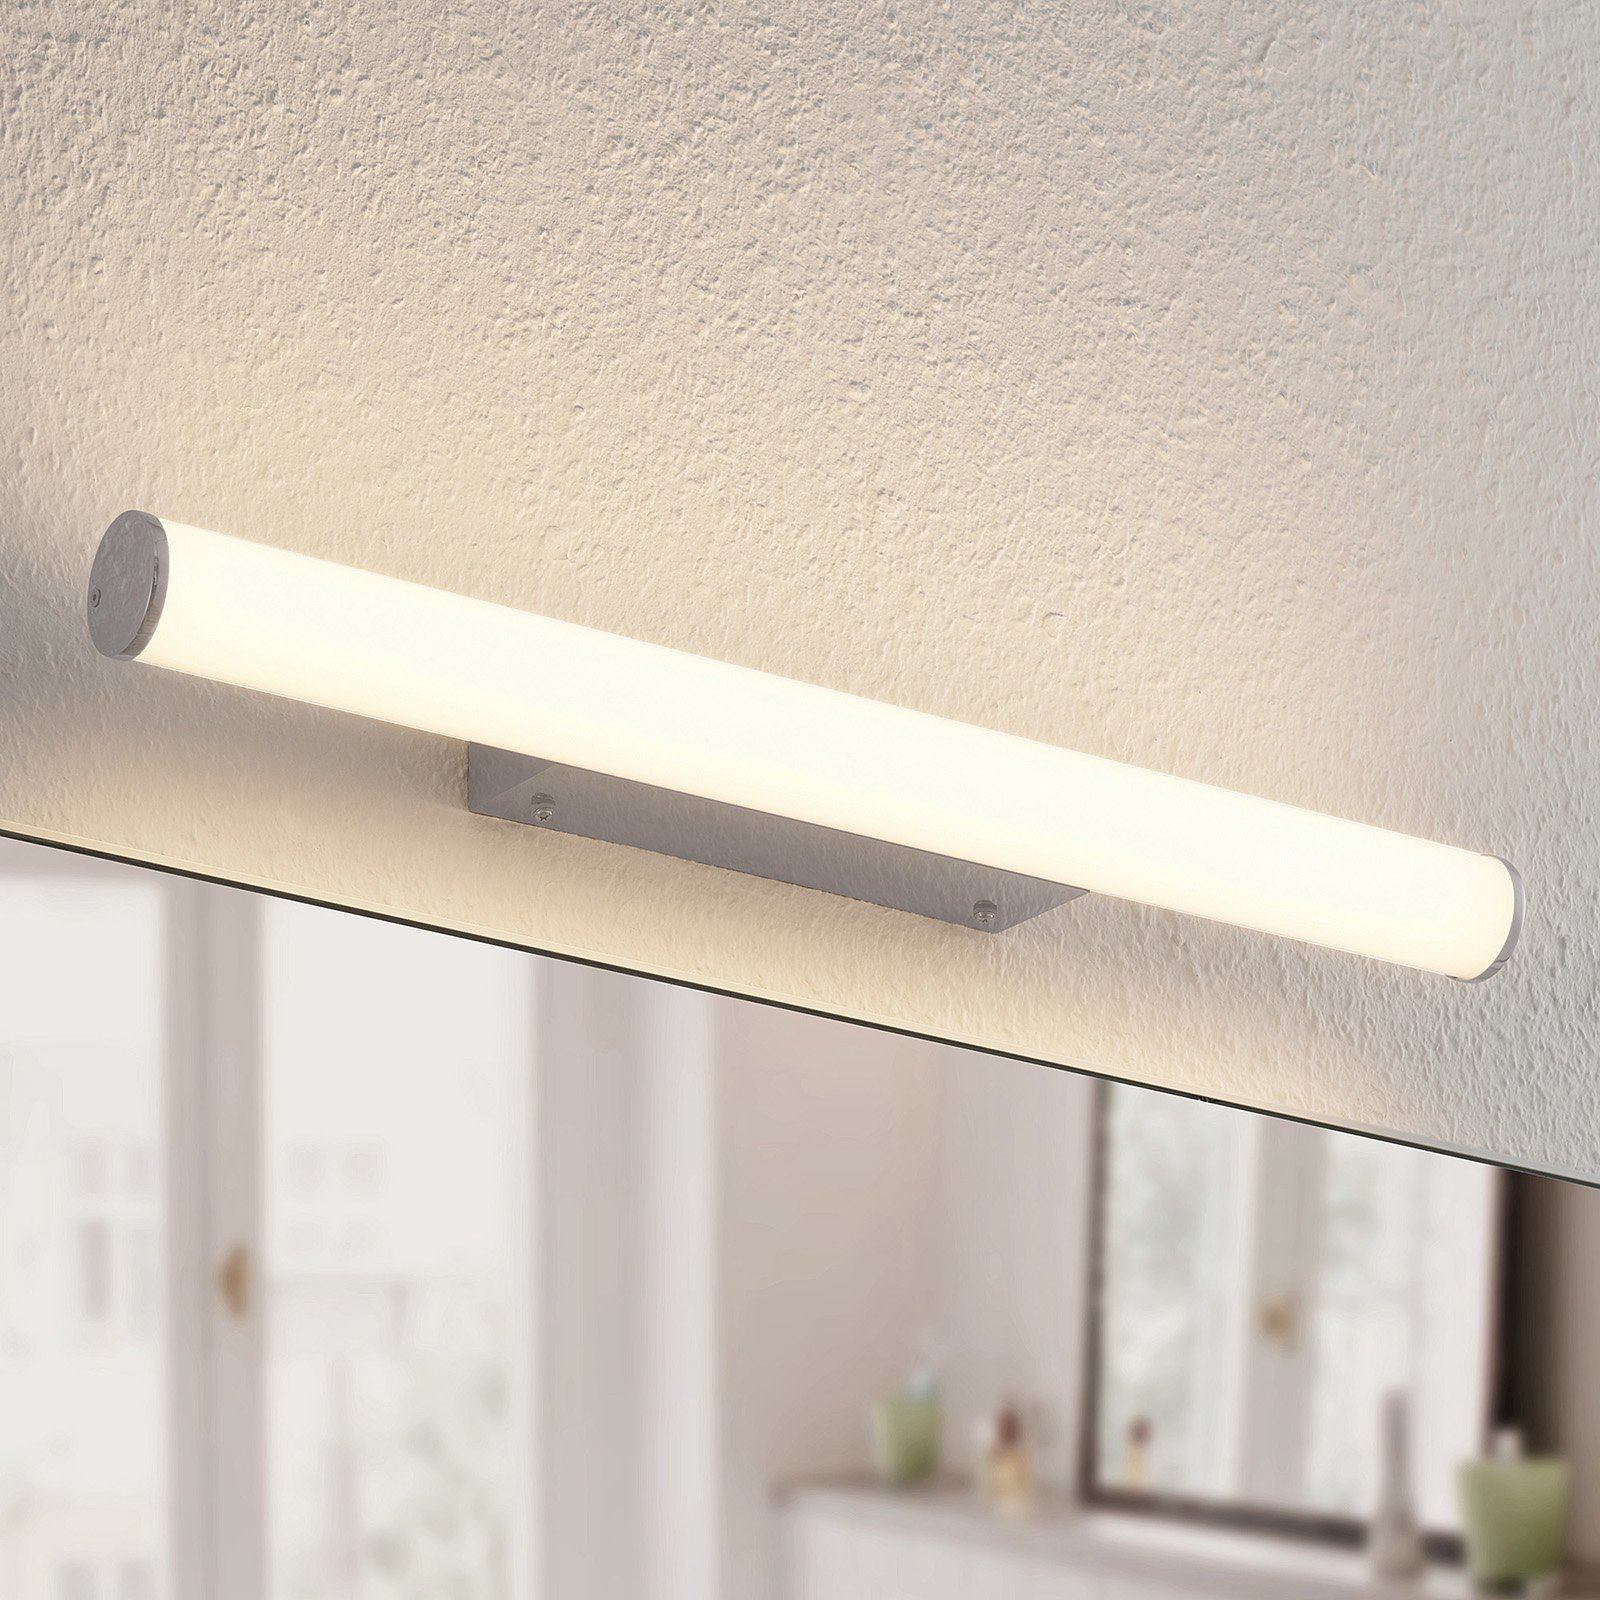 Lindby Sanbi LED-speillampe, 60 cm